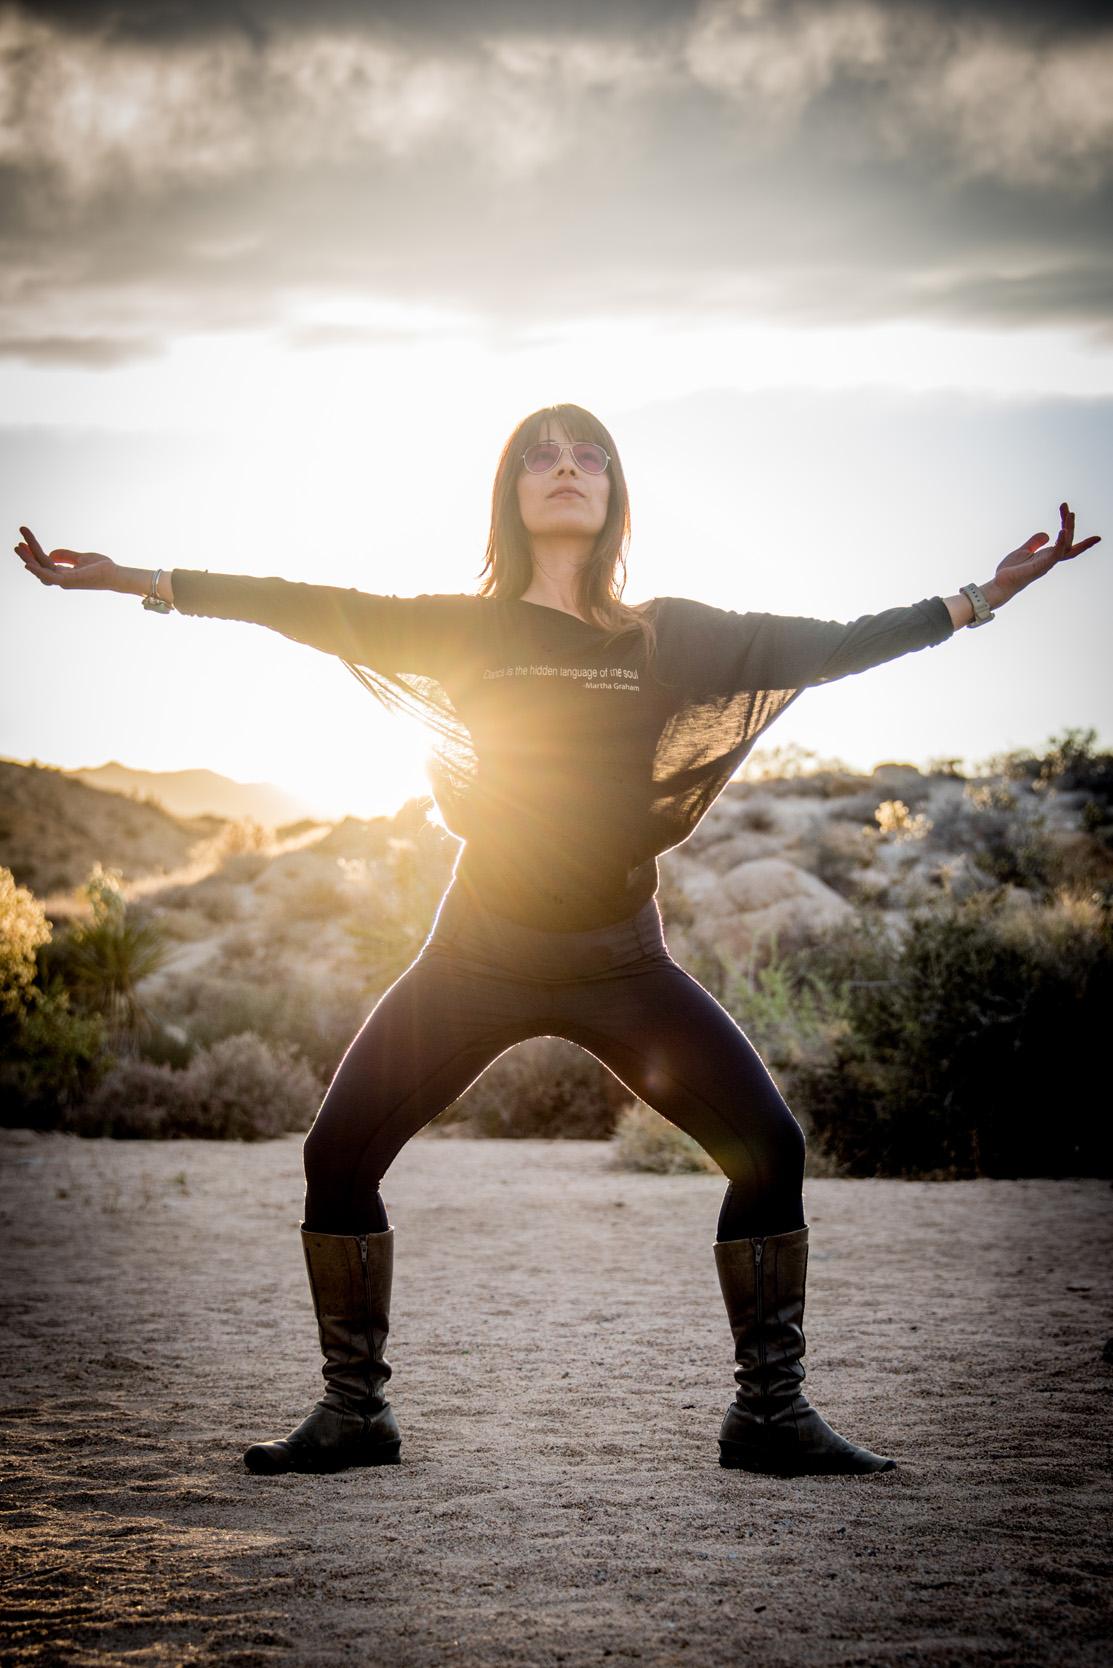 Britt_Nemeth_Studios_PhotographyLive_Events_Elopements_Launches_Ceremony_Gatherings_Yoga_Retreat087.jpg